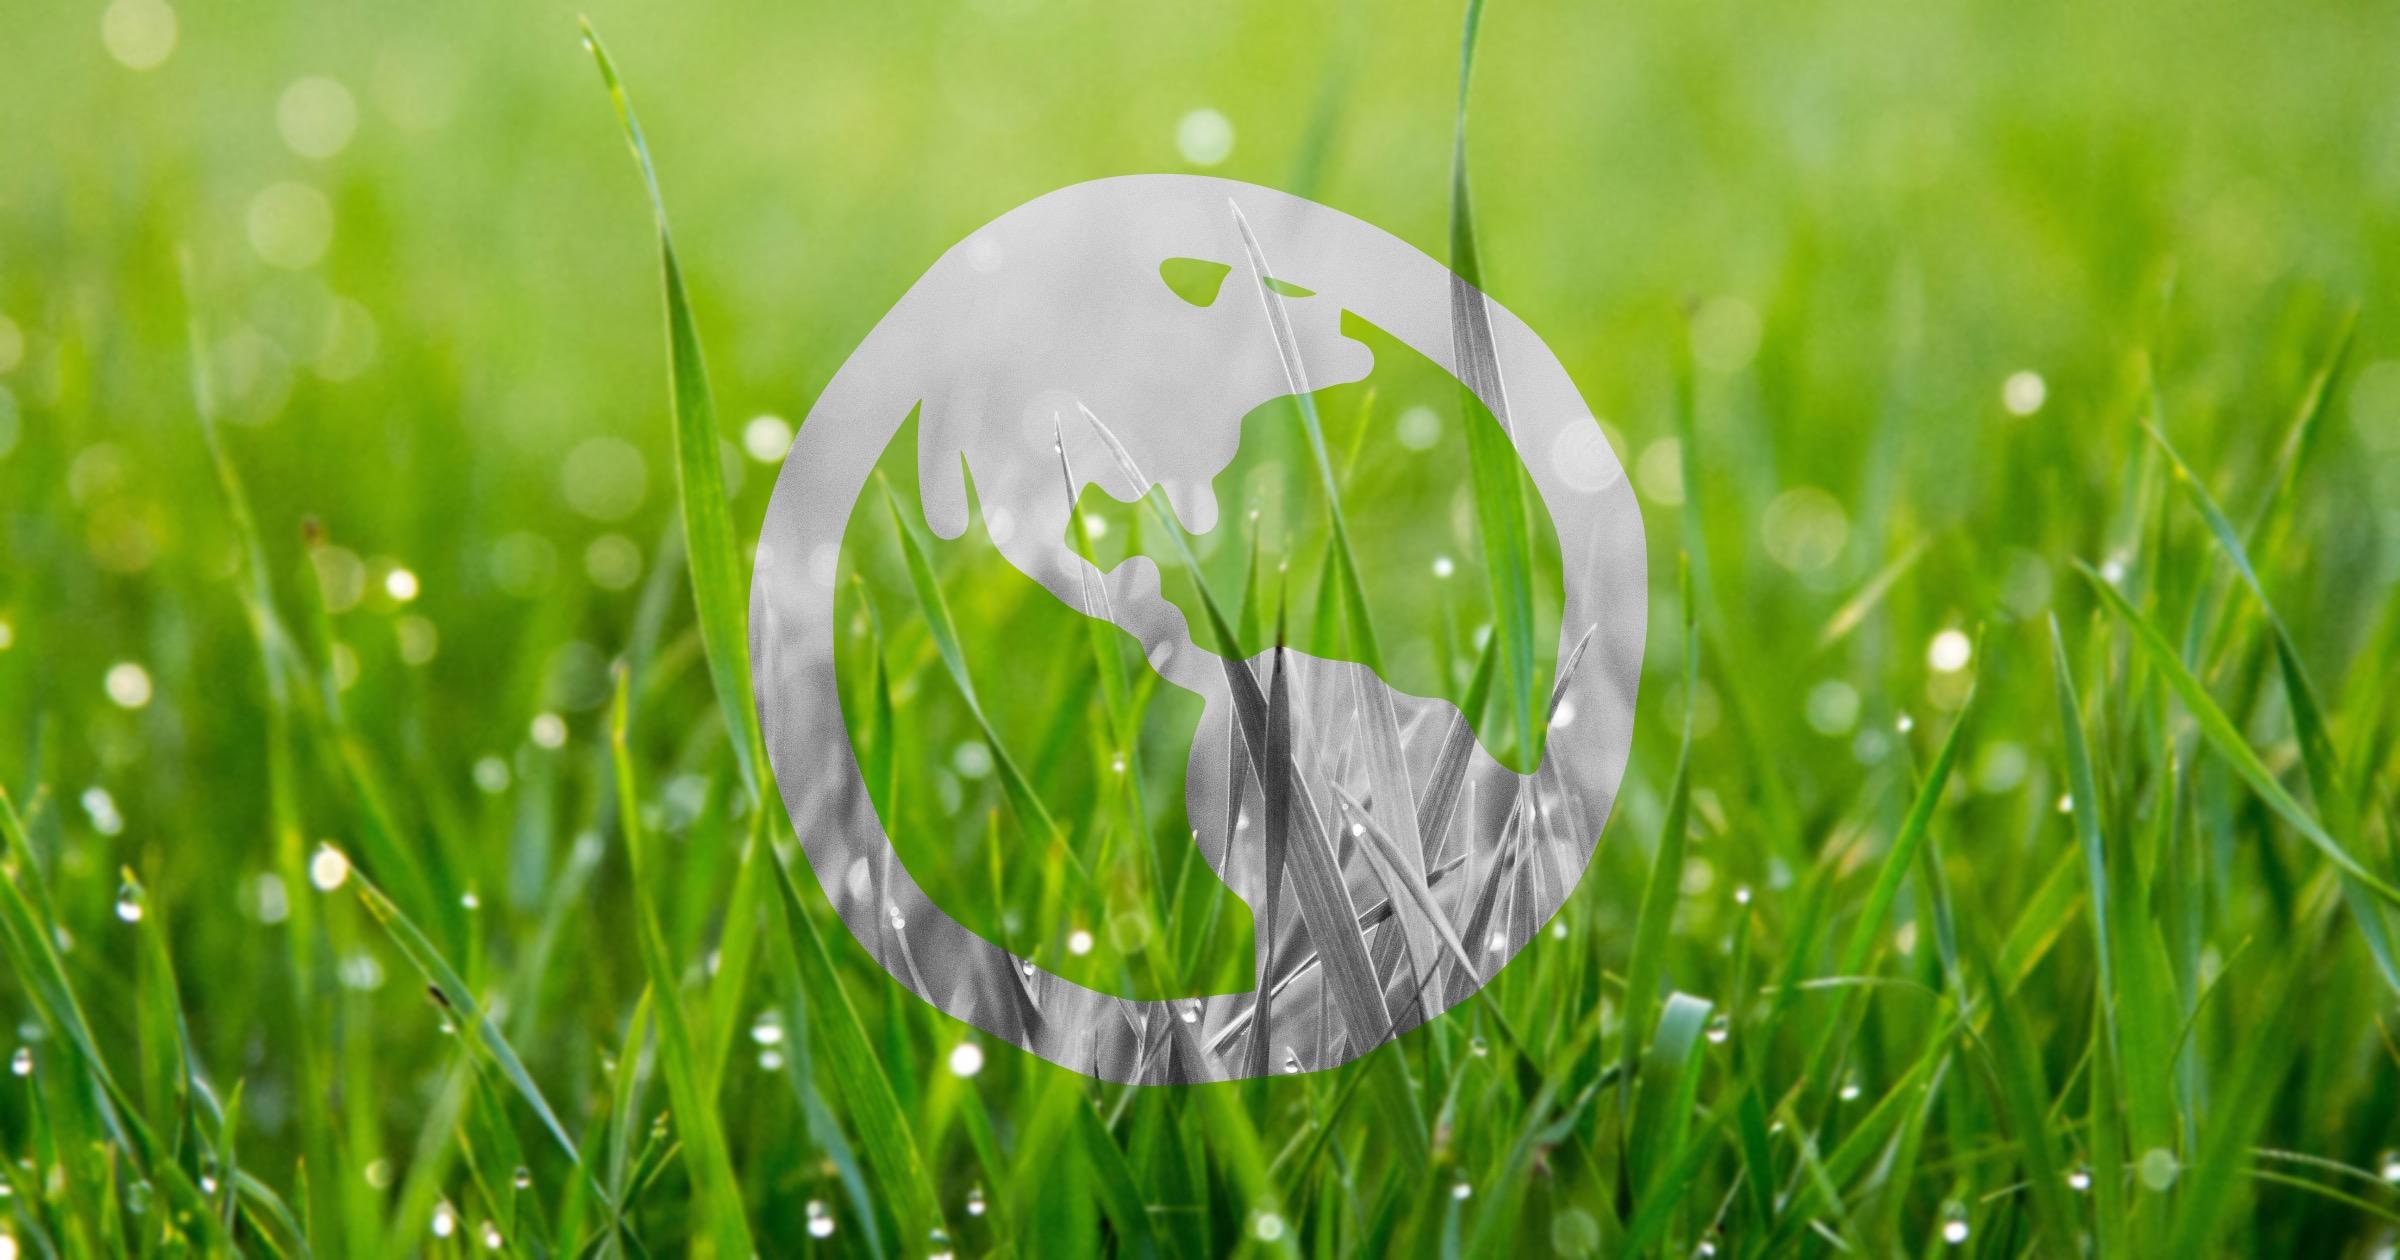 Apple 2021 environmental progress report